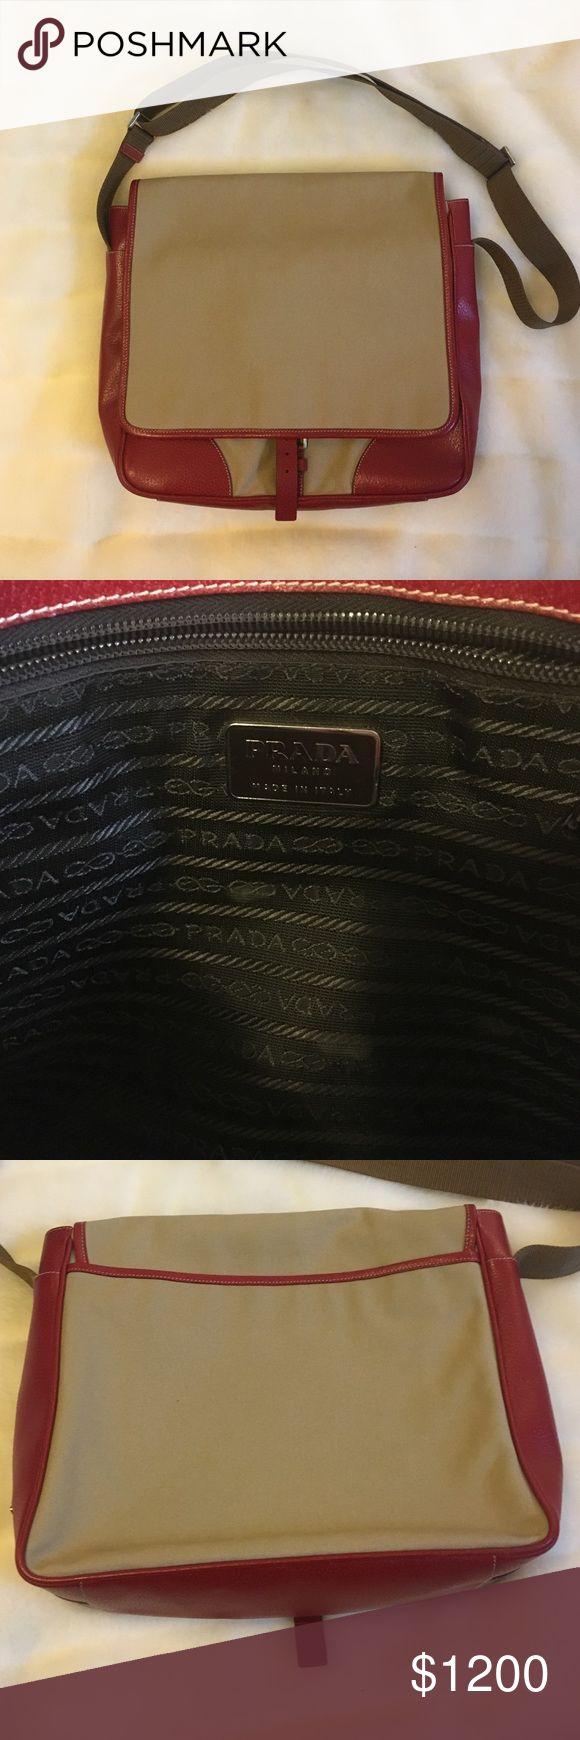 Authentic Prada messenger bag Authentic Prada messenger bag, red pig skin leather accents & khaki canvas. Prada Bags Crossbody Bags